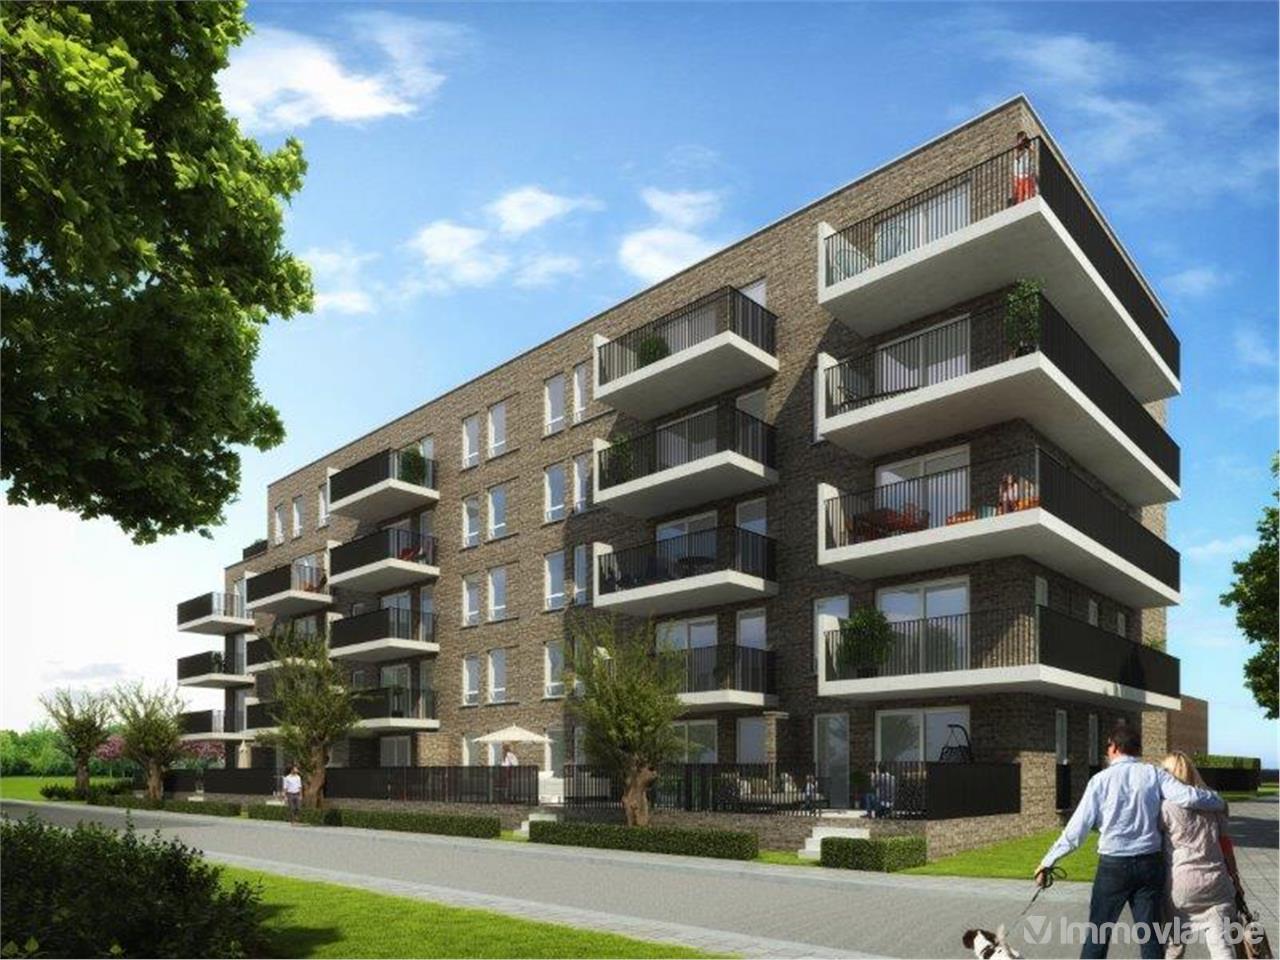 Appartement in amsterdamstraat 1 sint niklaas for Appartement te koop oostenrijk tirol